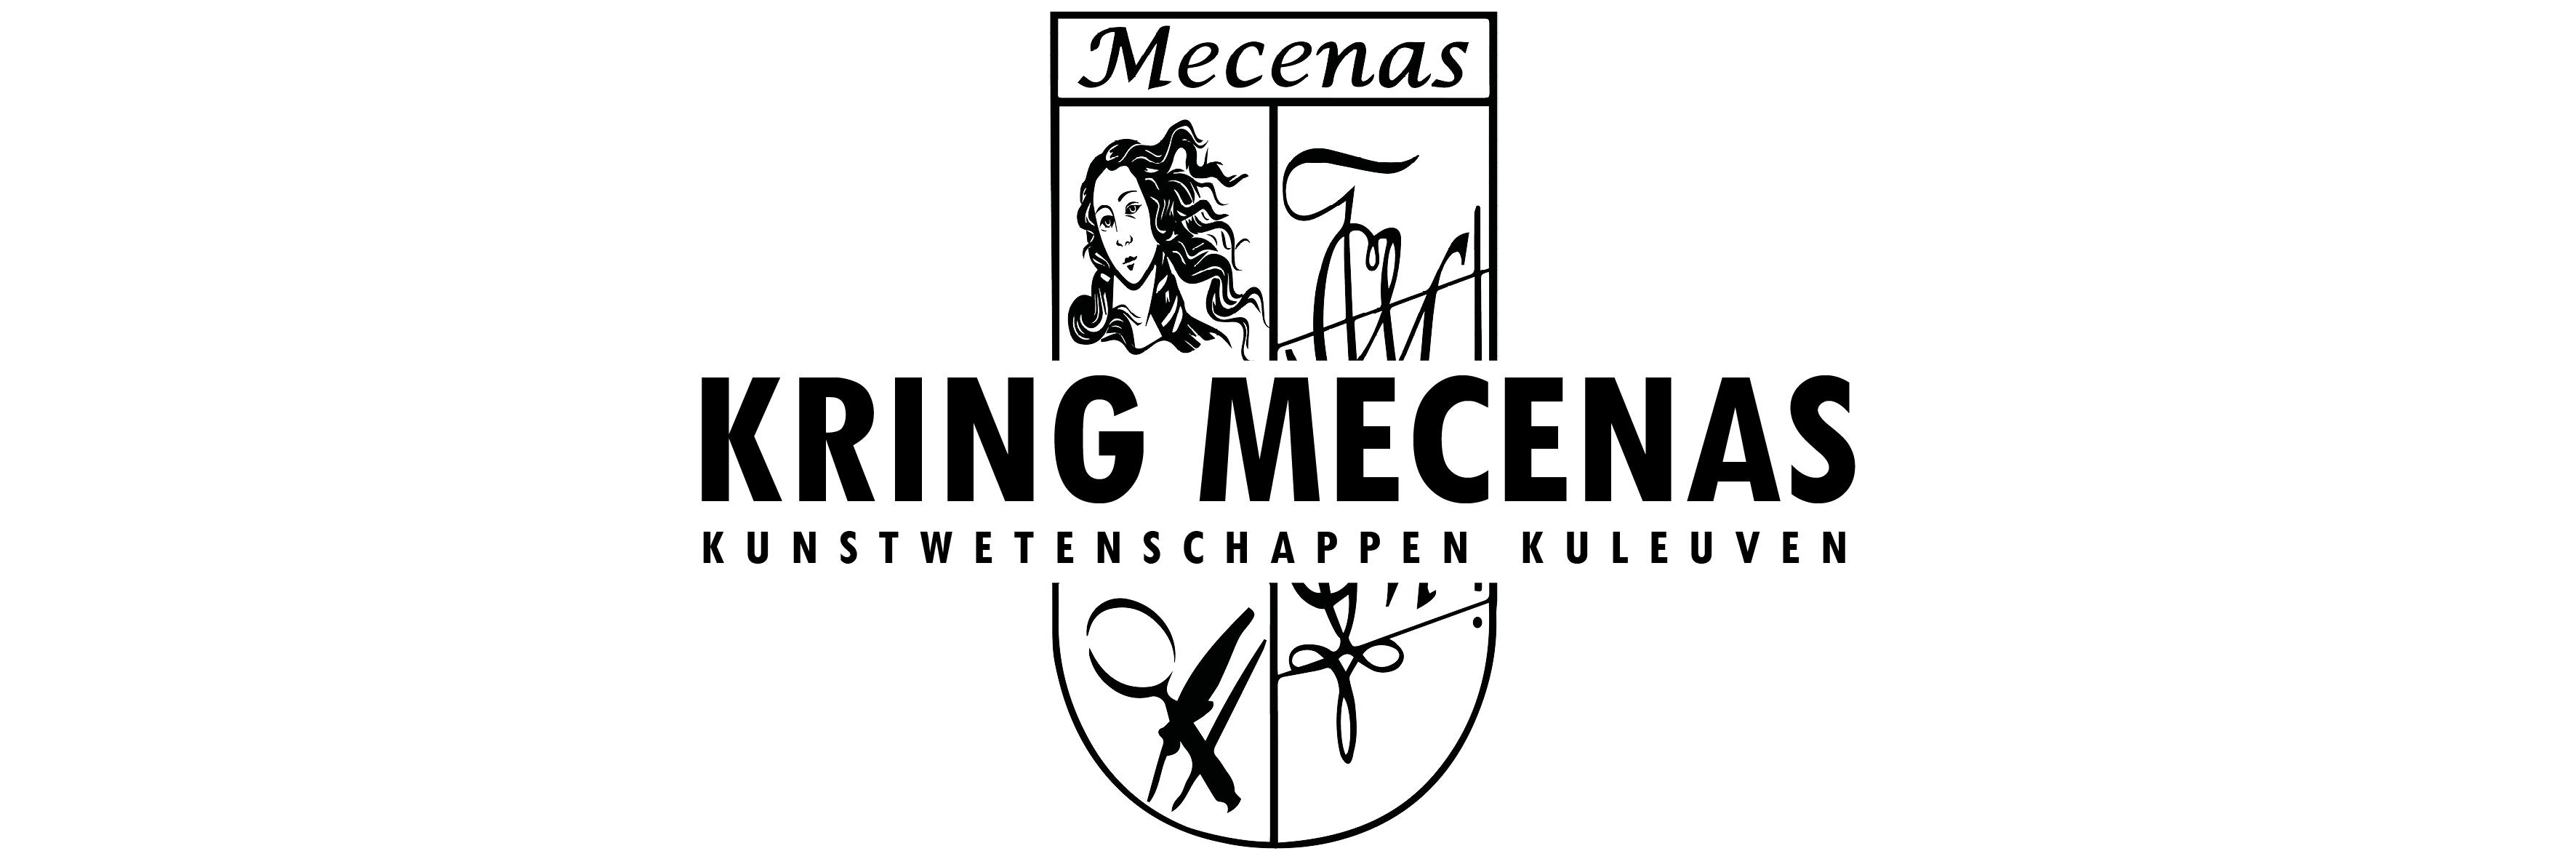 Mecenas